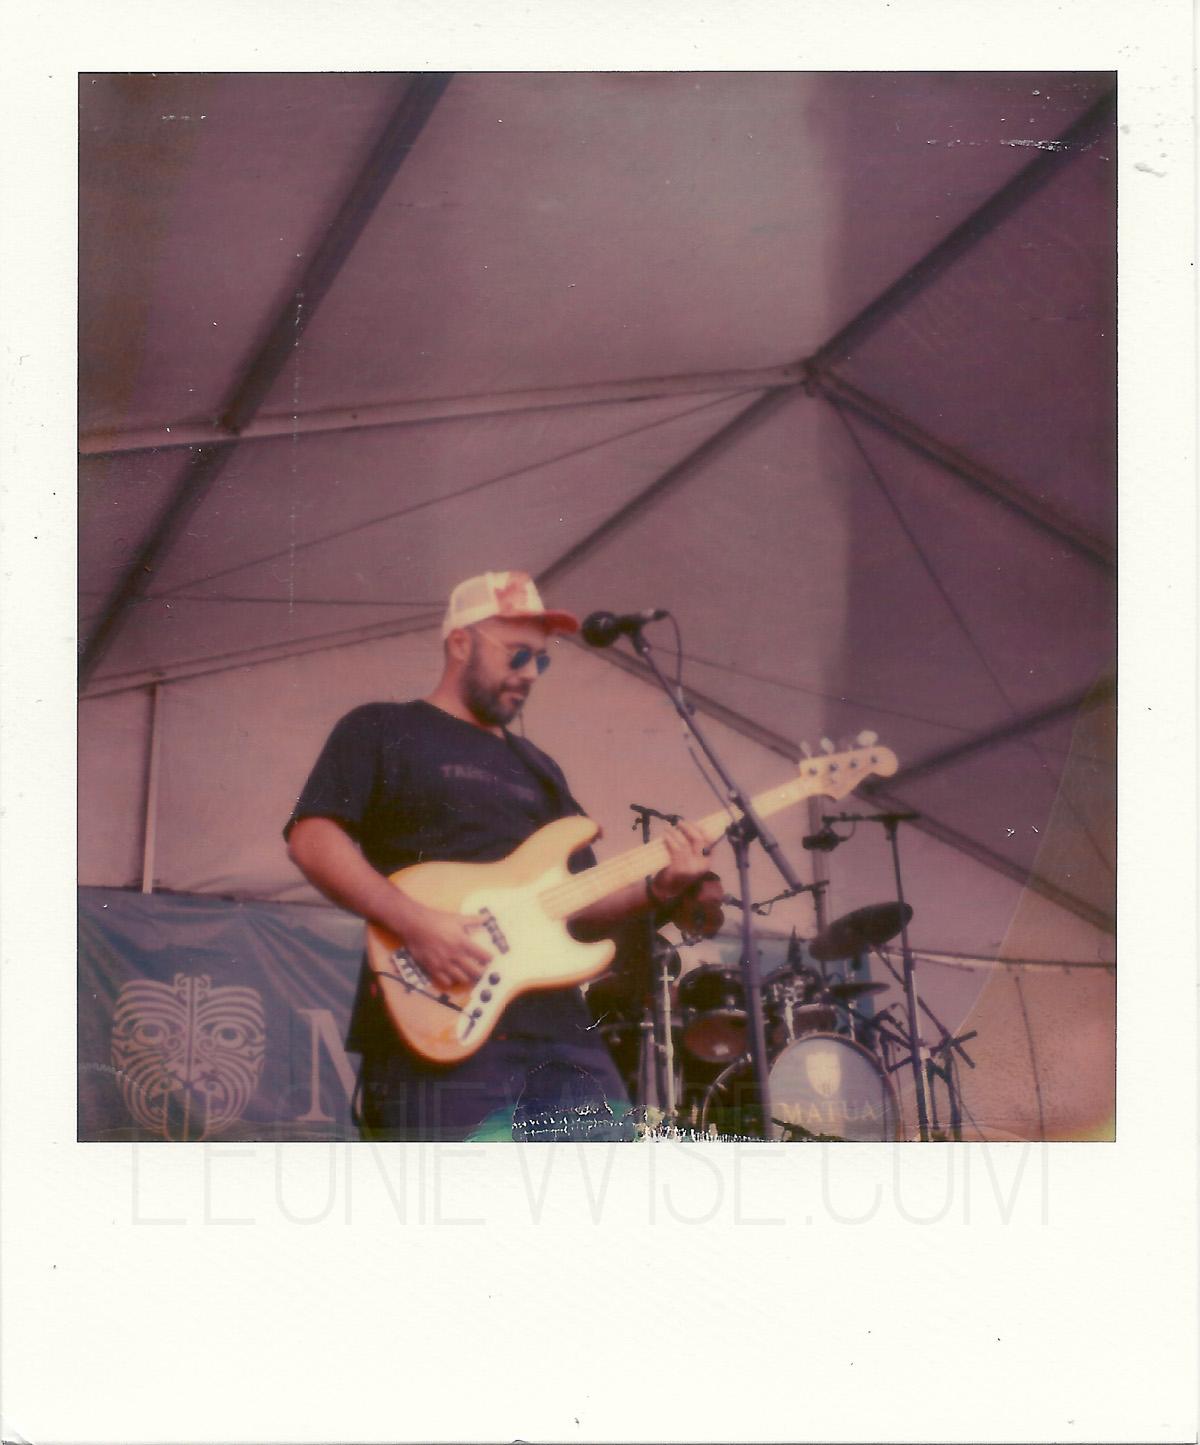 MusicAtMatua_Polaroid-SX70_Impossible-PX70_leoniewise-4